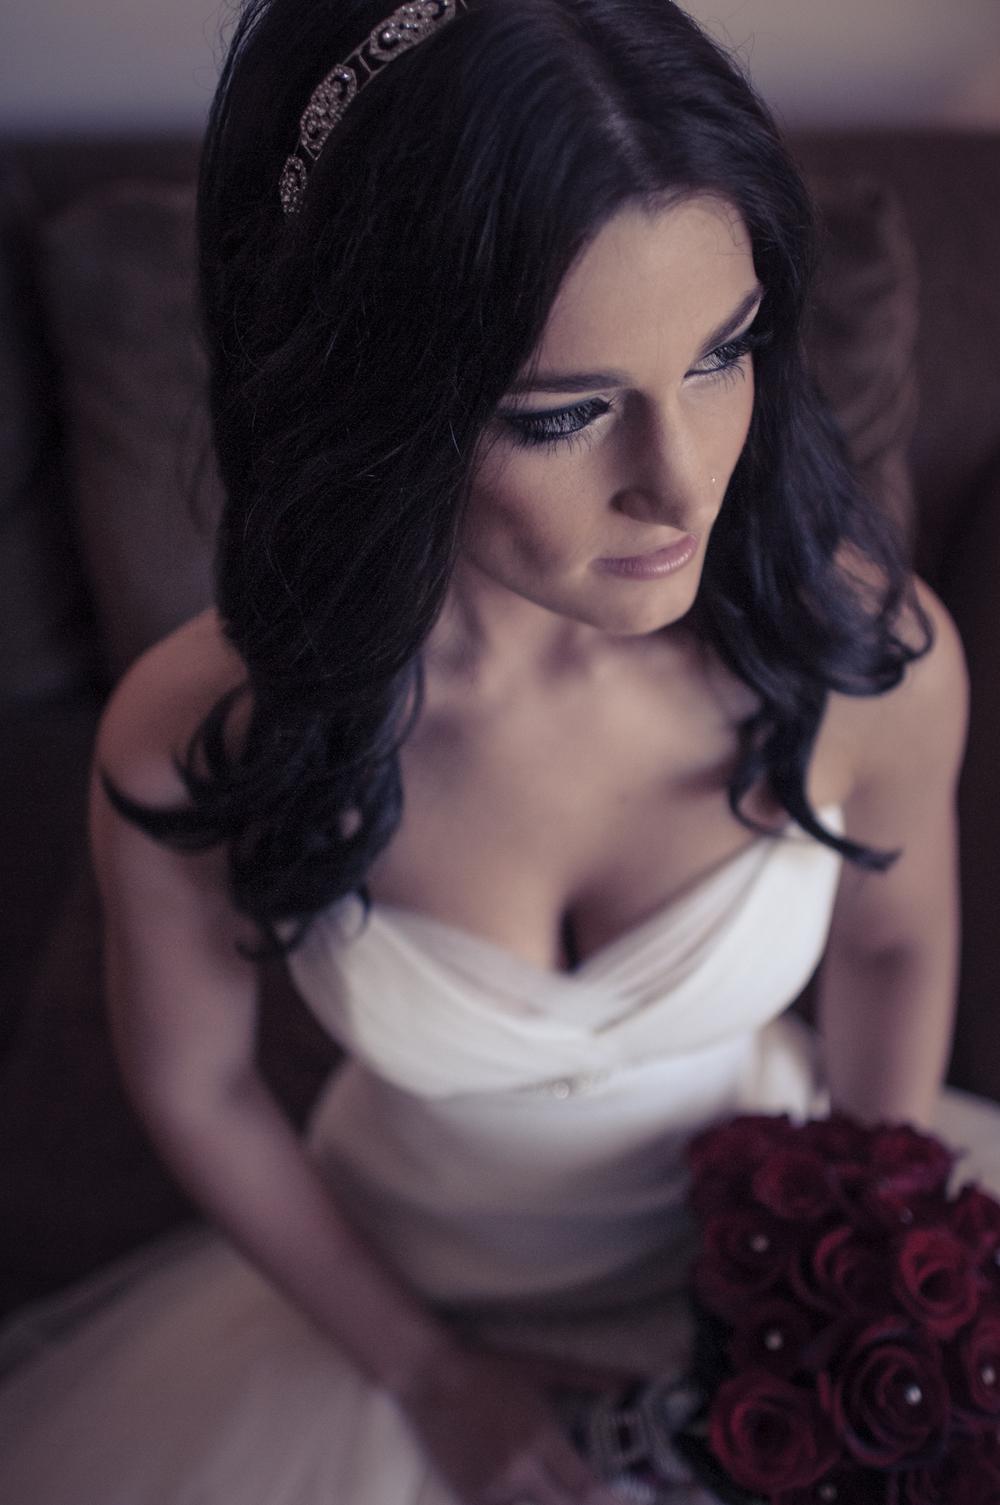 lisa_benny-2909.jpg